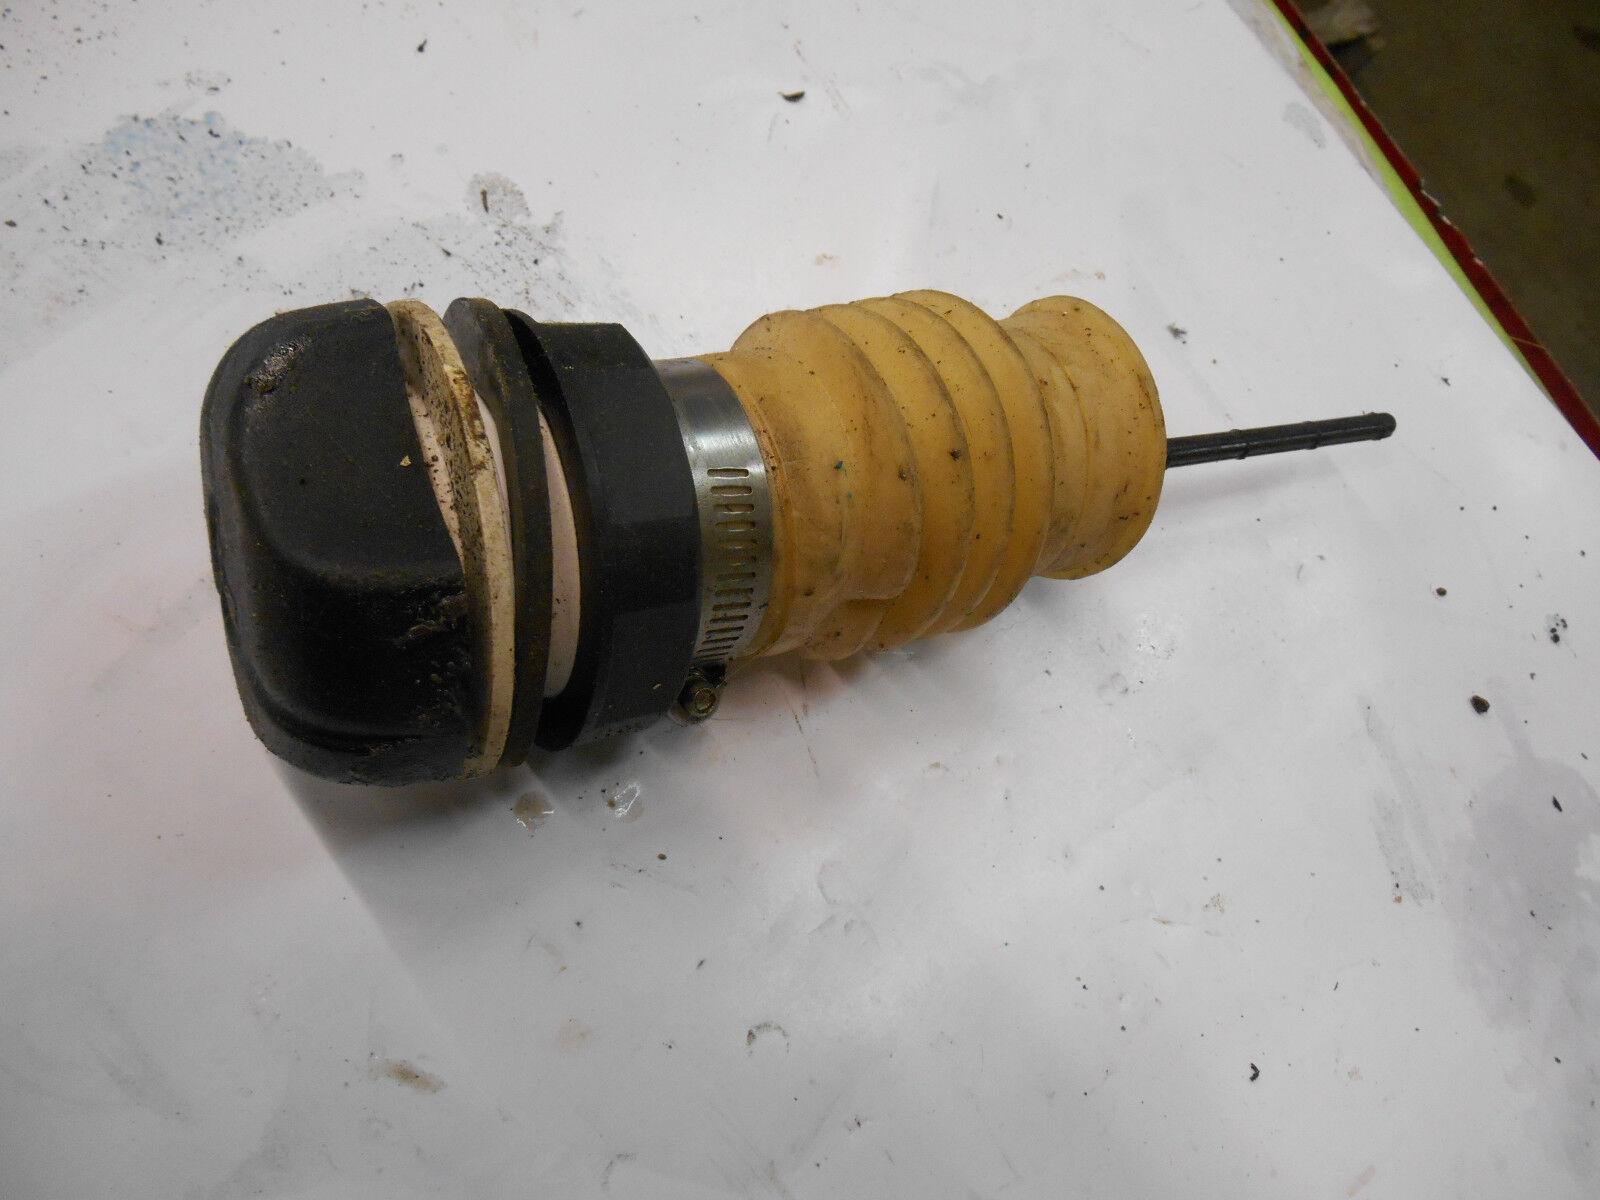 SeaDoo SPI XP SPX GTX GTS GTI SP Oil Tank Fill Cap Neck hose dipstick